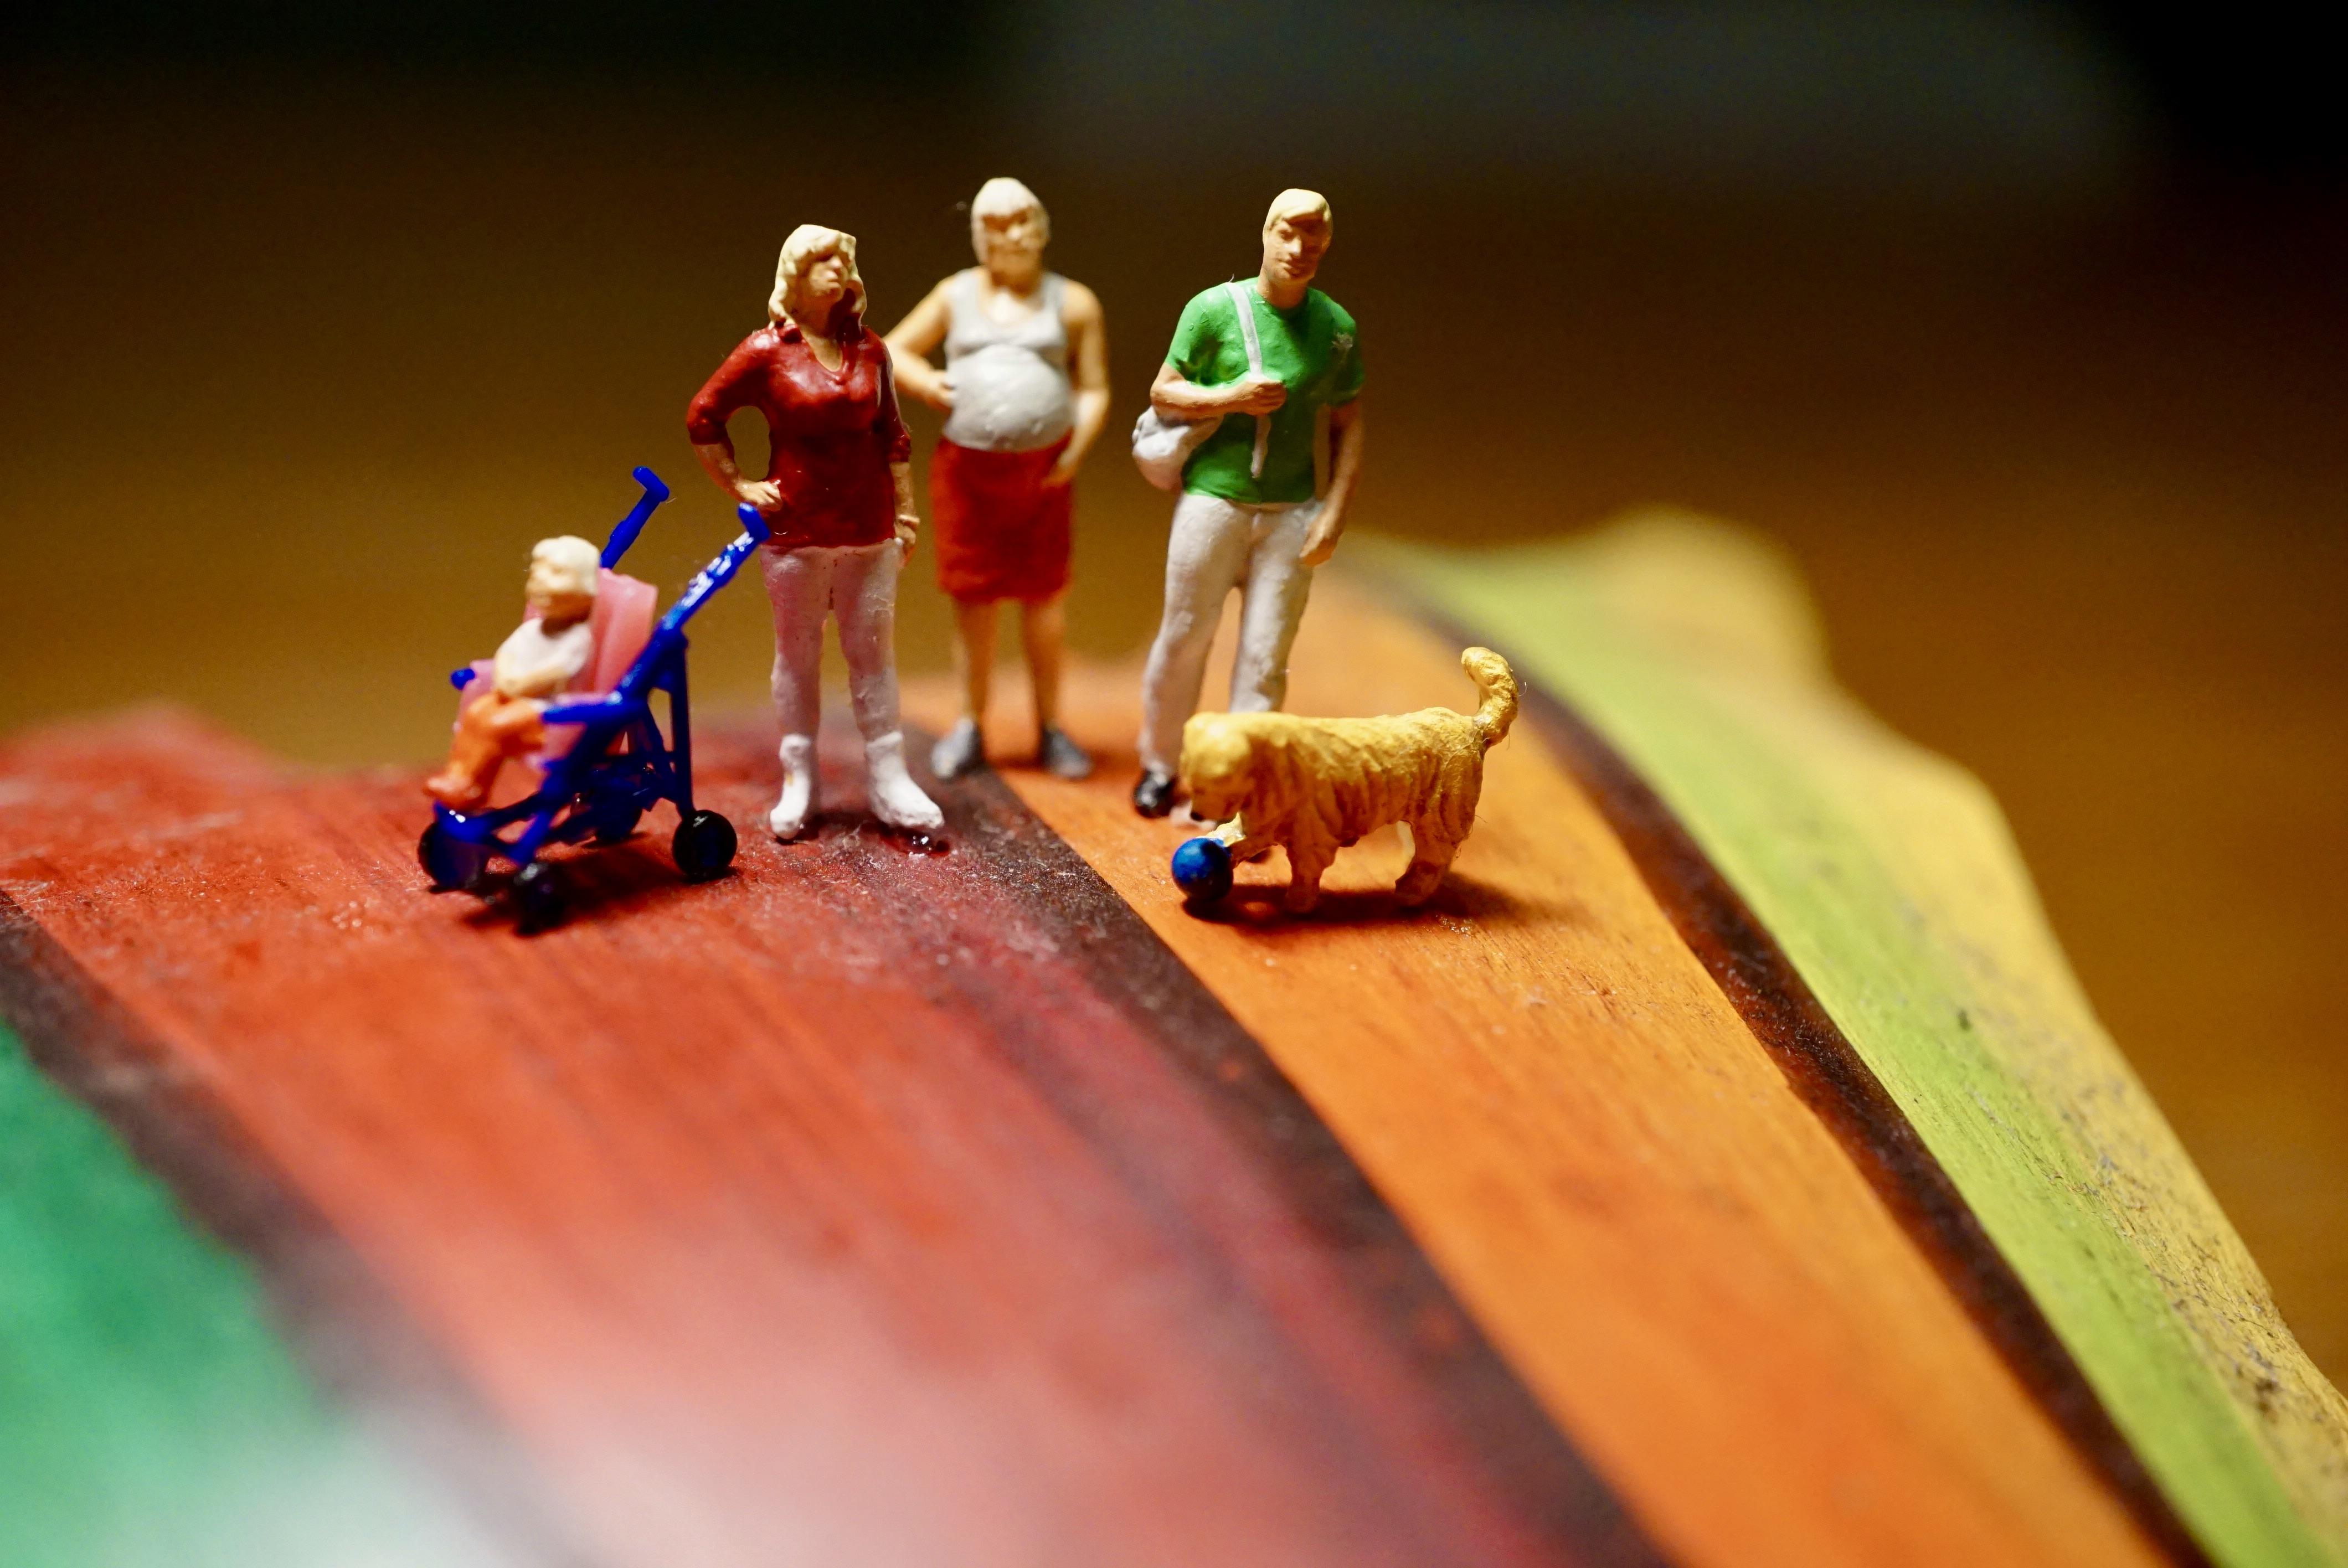 (c)miniaturfamilie; regenbogenfamilienköln